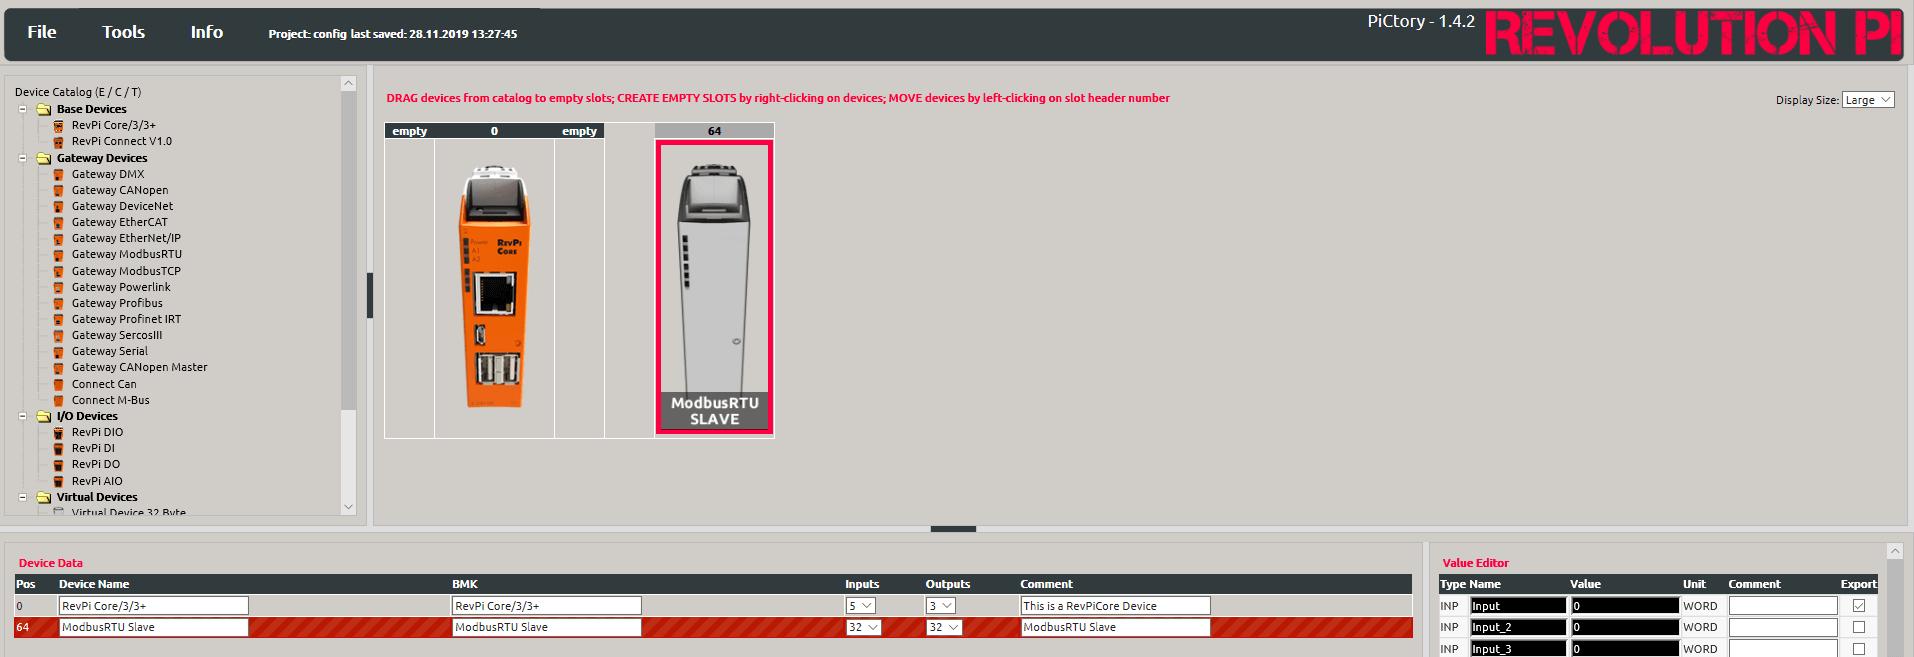 Modulkonfiguration über PiCtory Screenshot